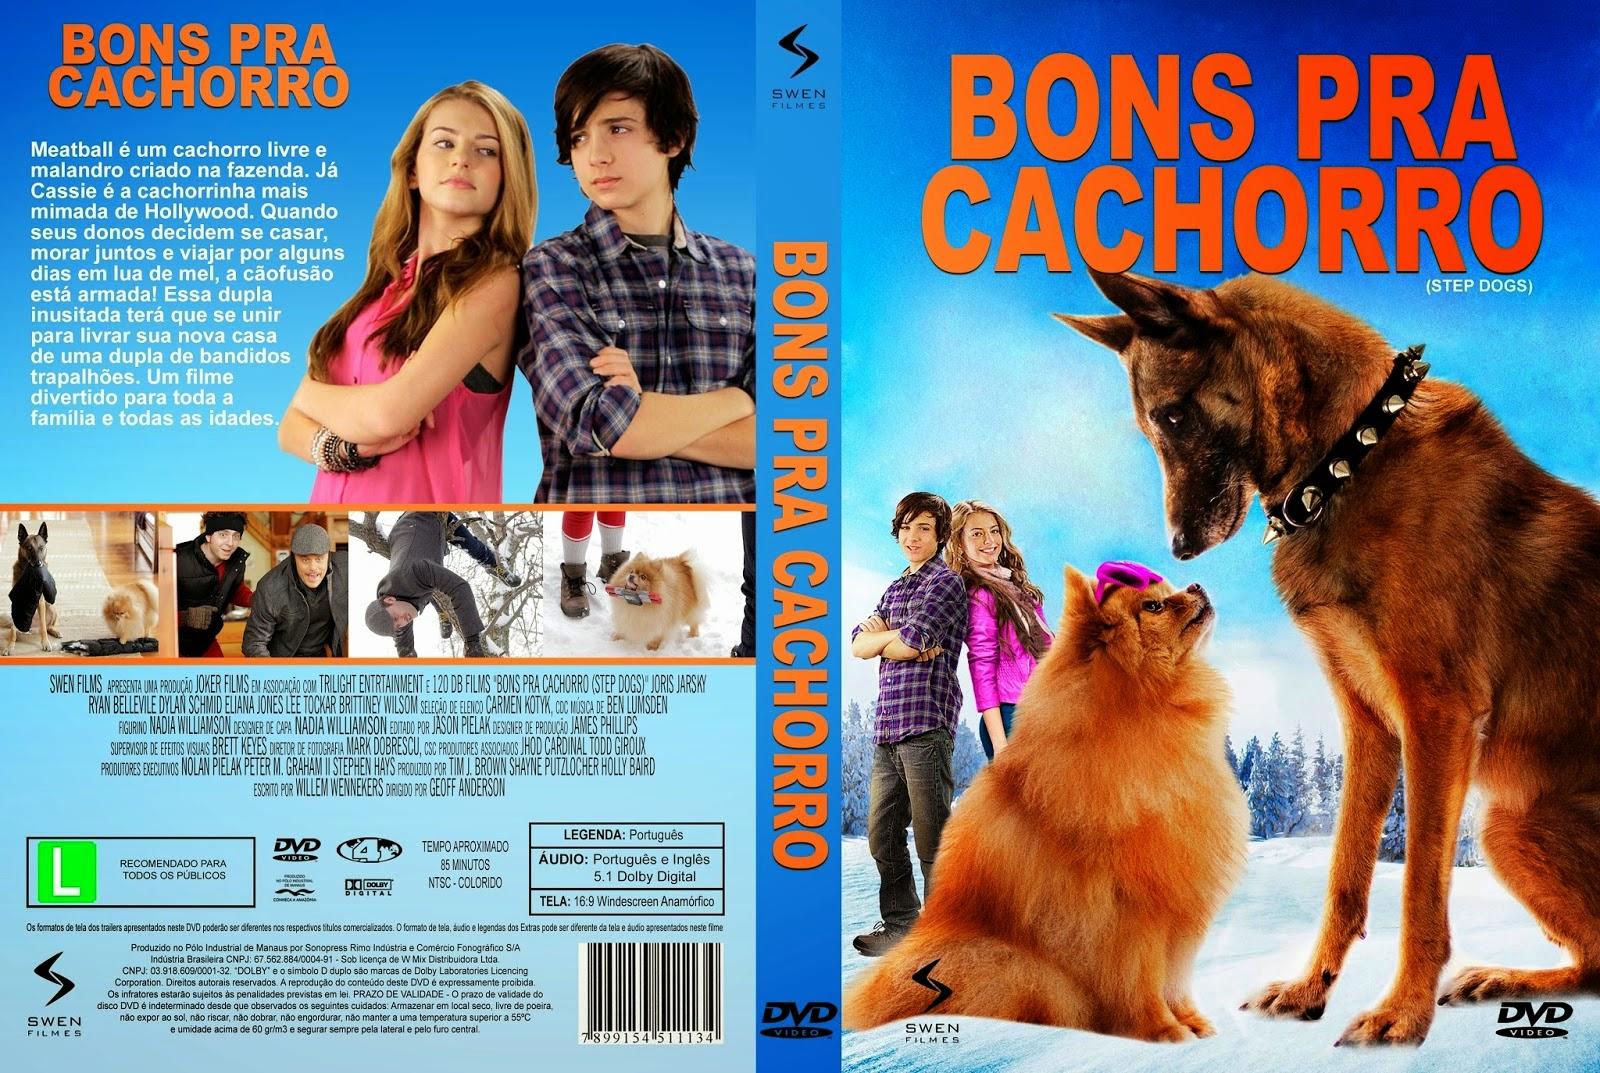 Bons pra Cachorro DVDRip XviD Dual Áudio Bons Pra Cachorro   Capa Filme DVD